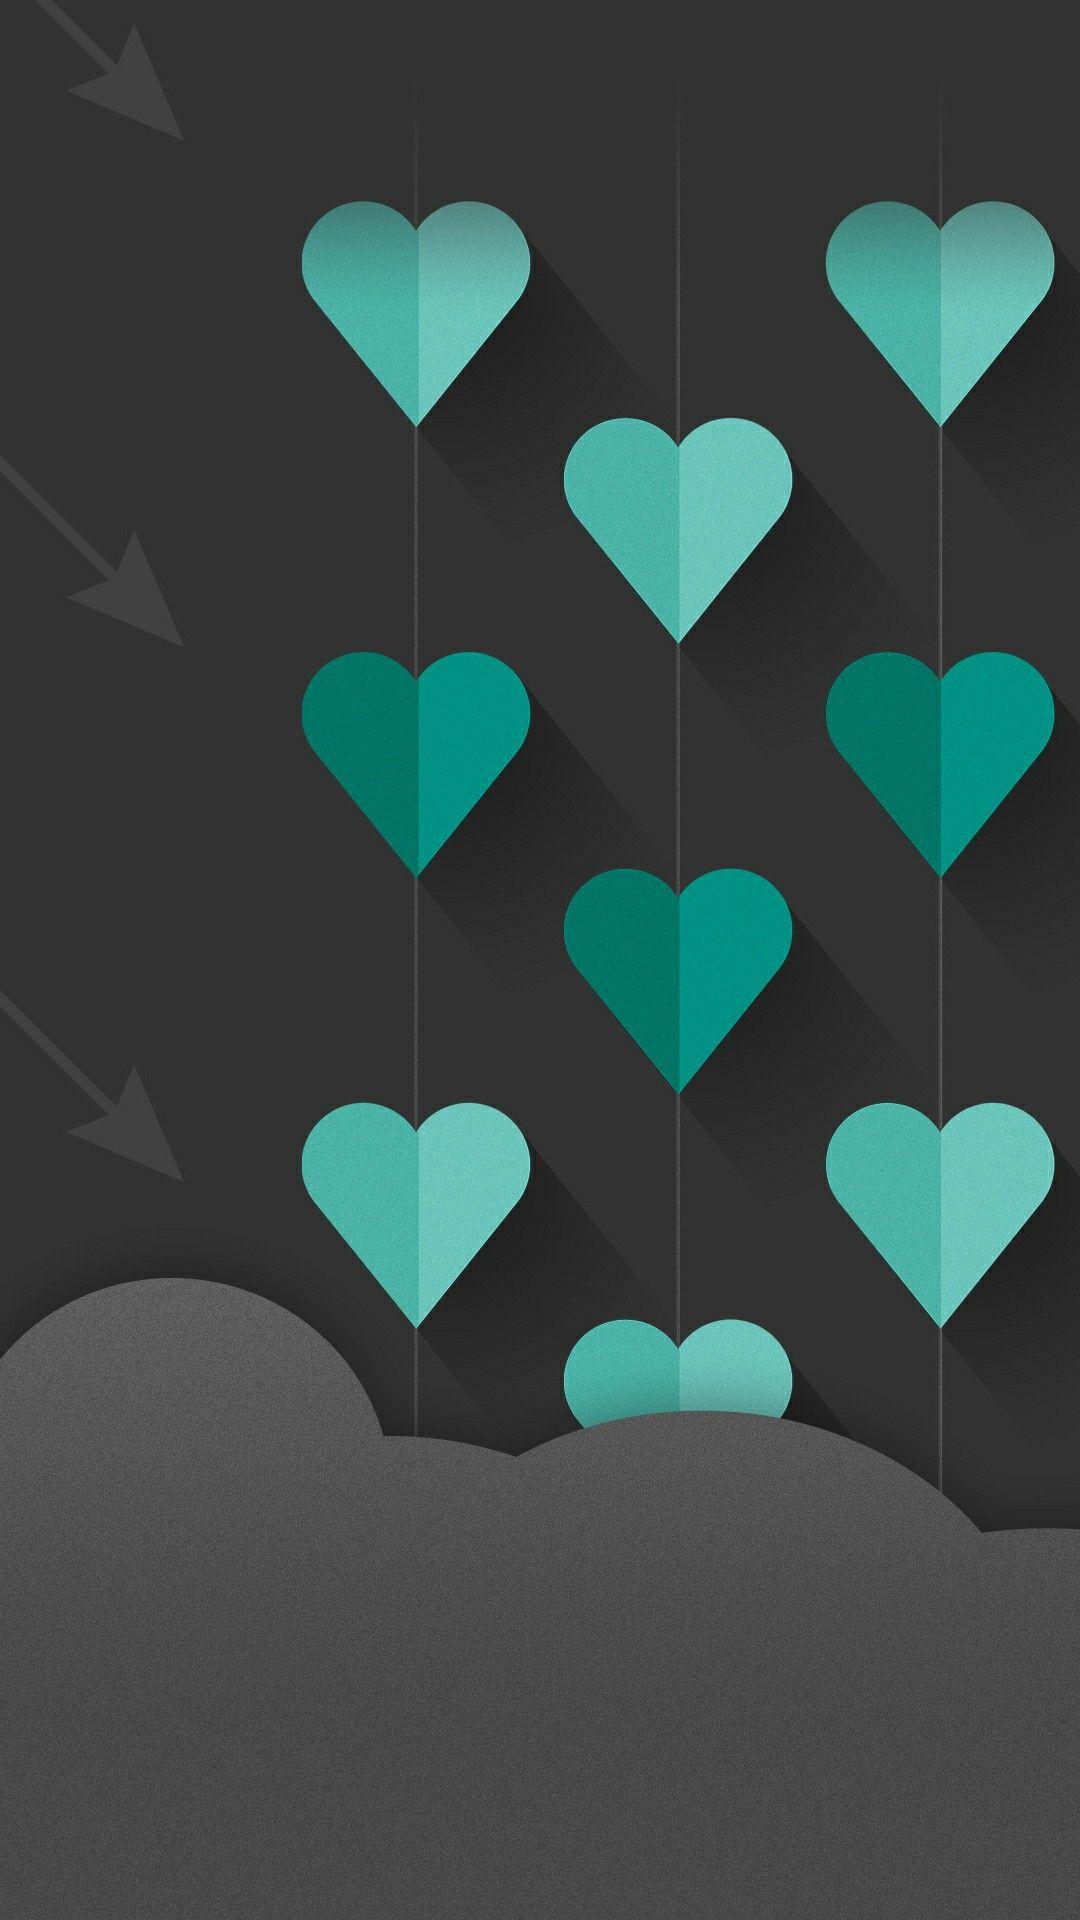 Teal Hearts Heart Iphone Wallpaper Heart Wallpaper Pretty Wallpapers